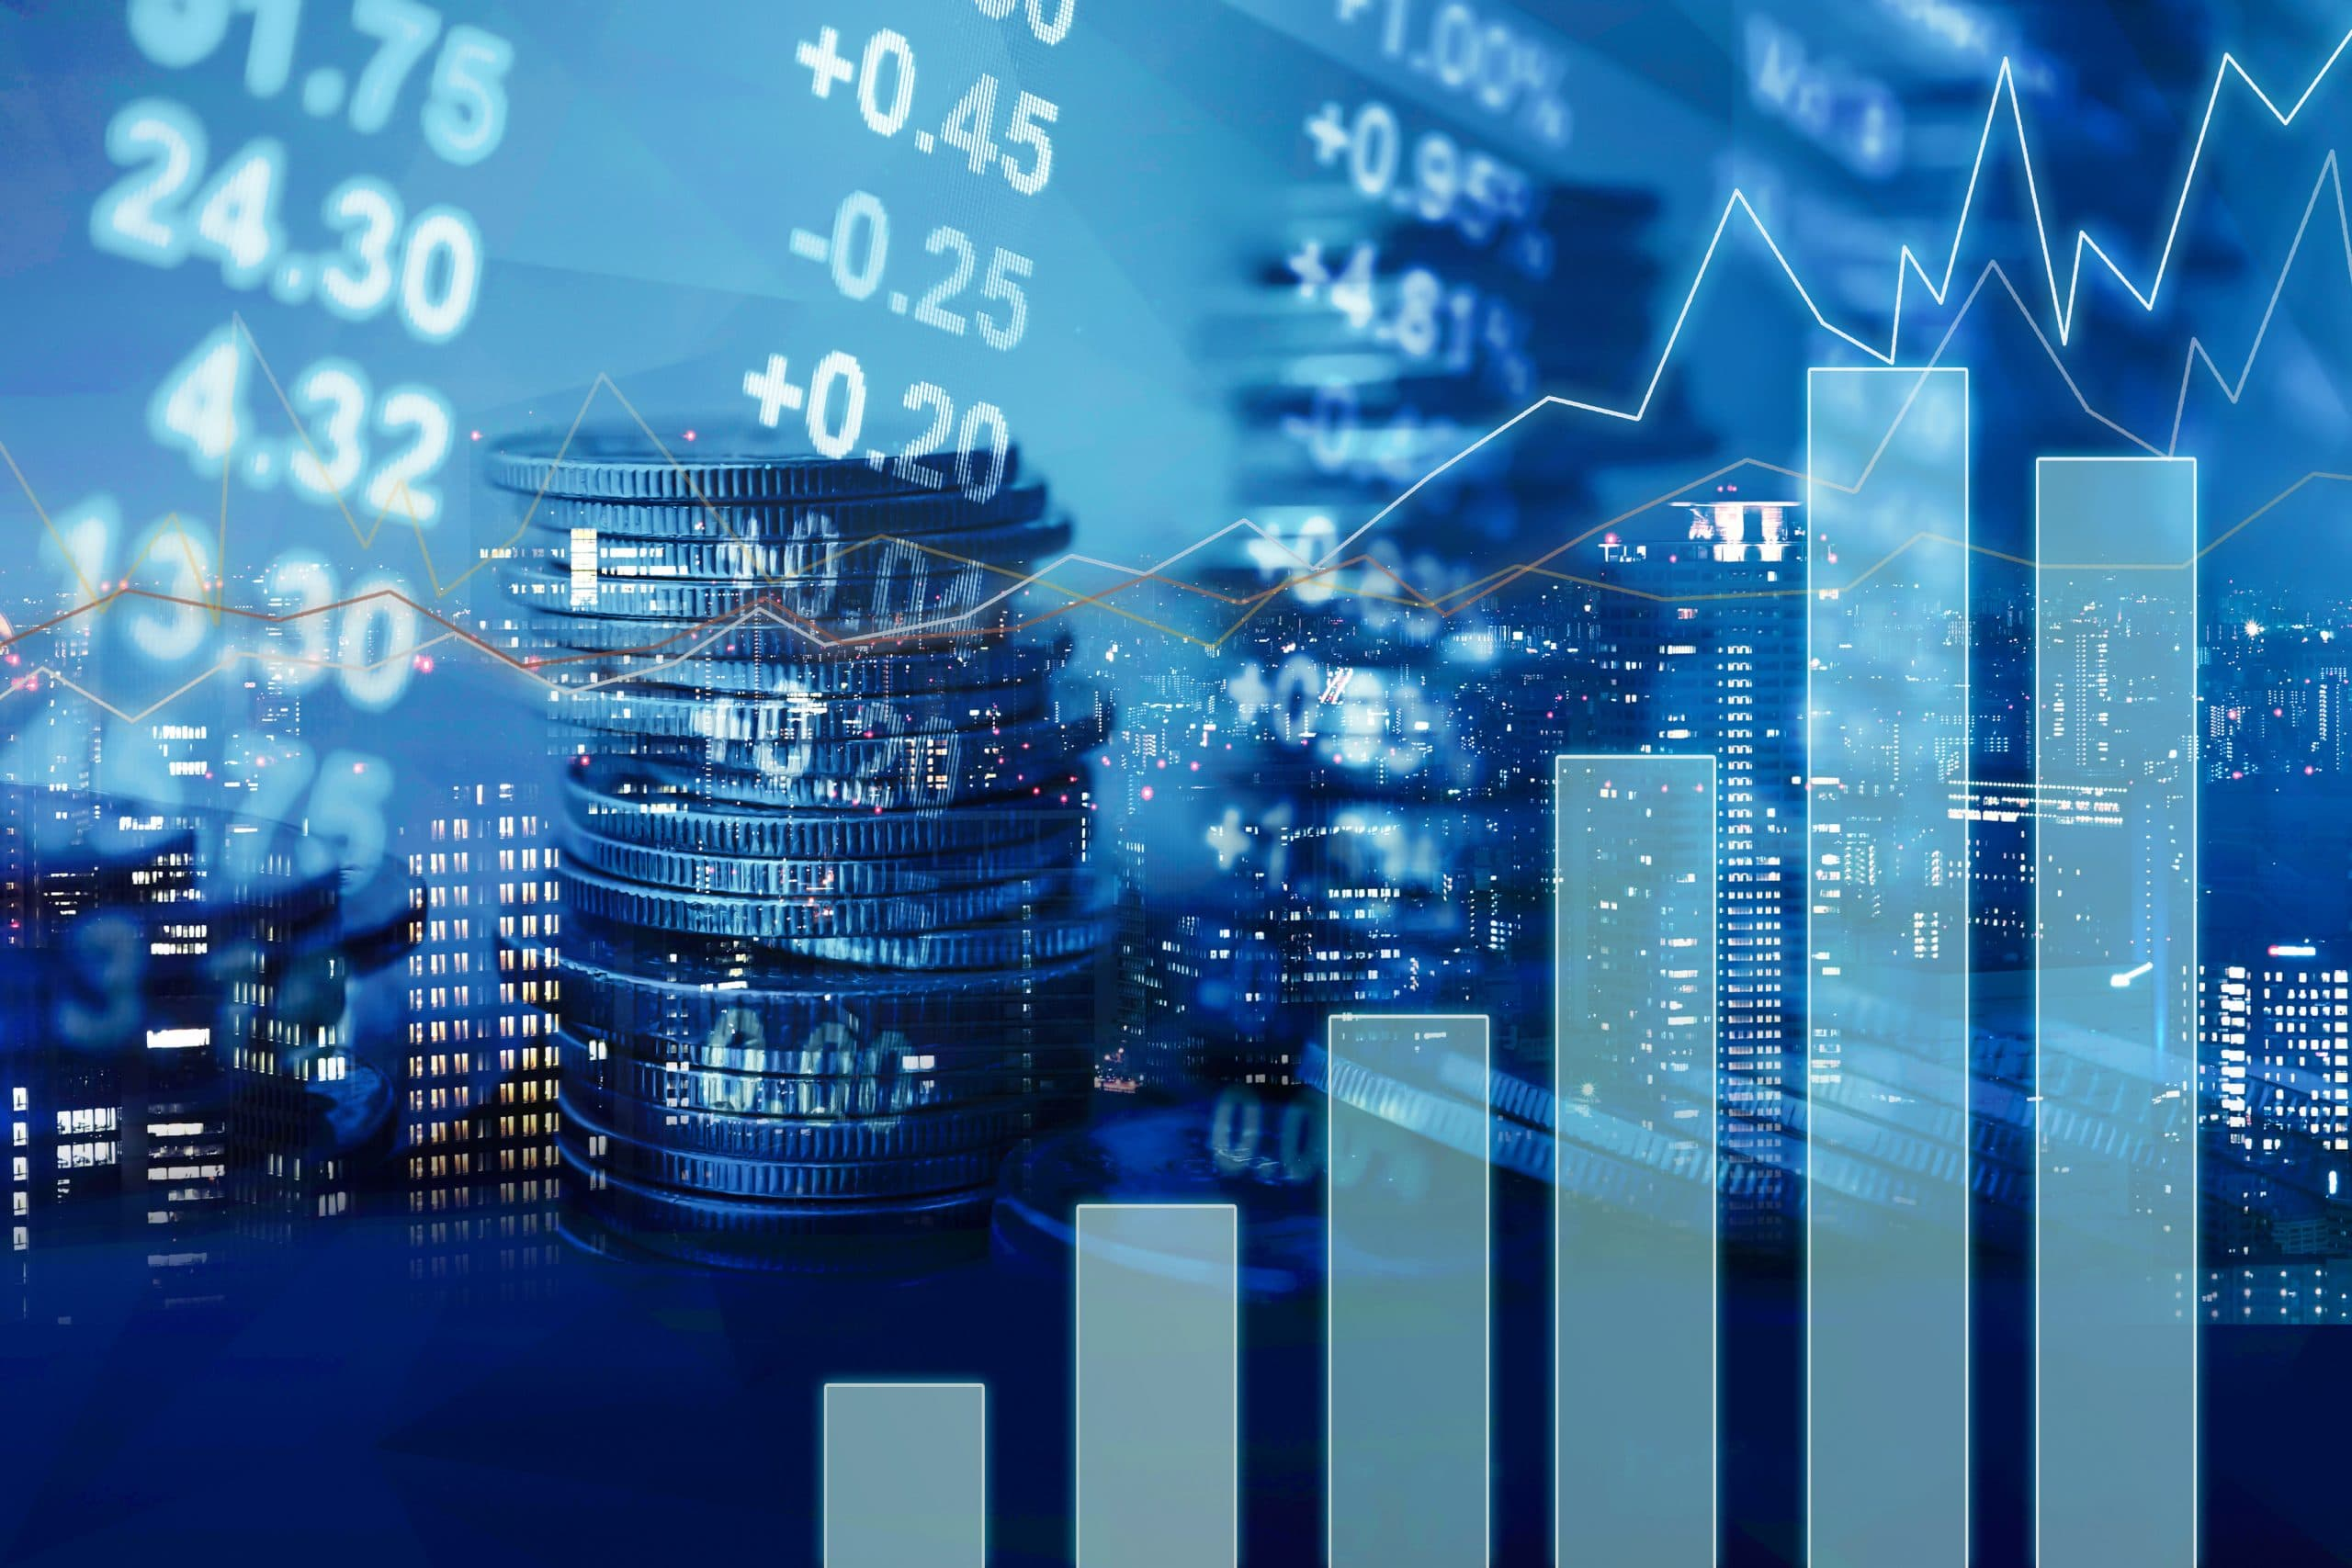 Financial liquidity in the company